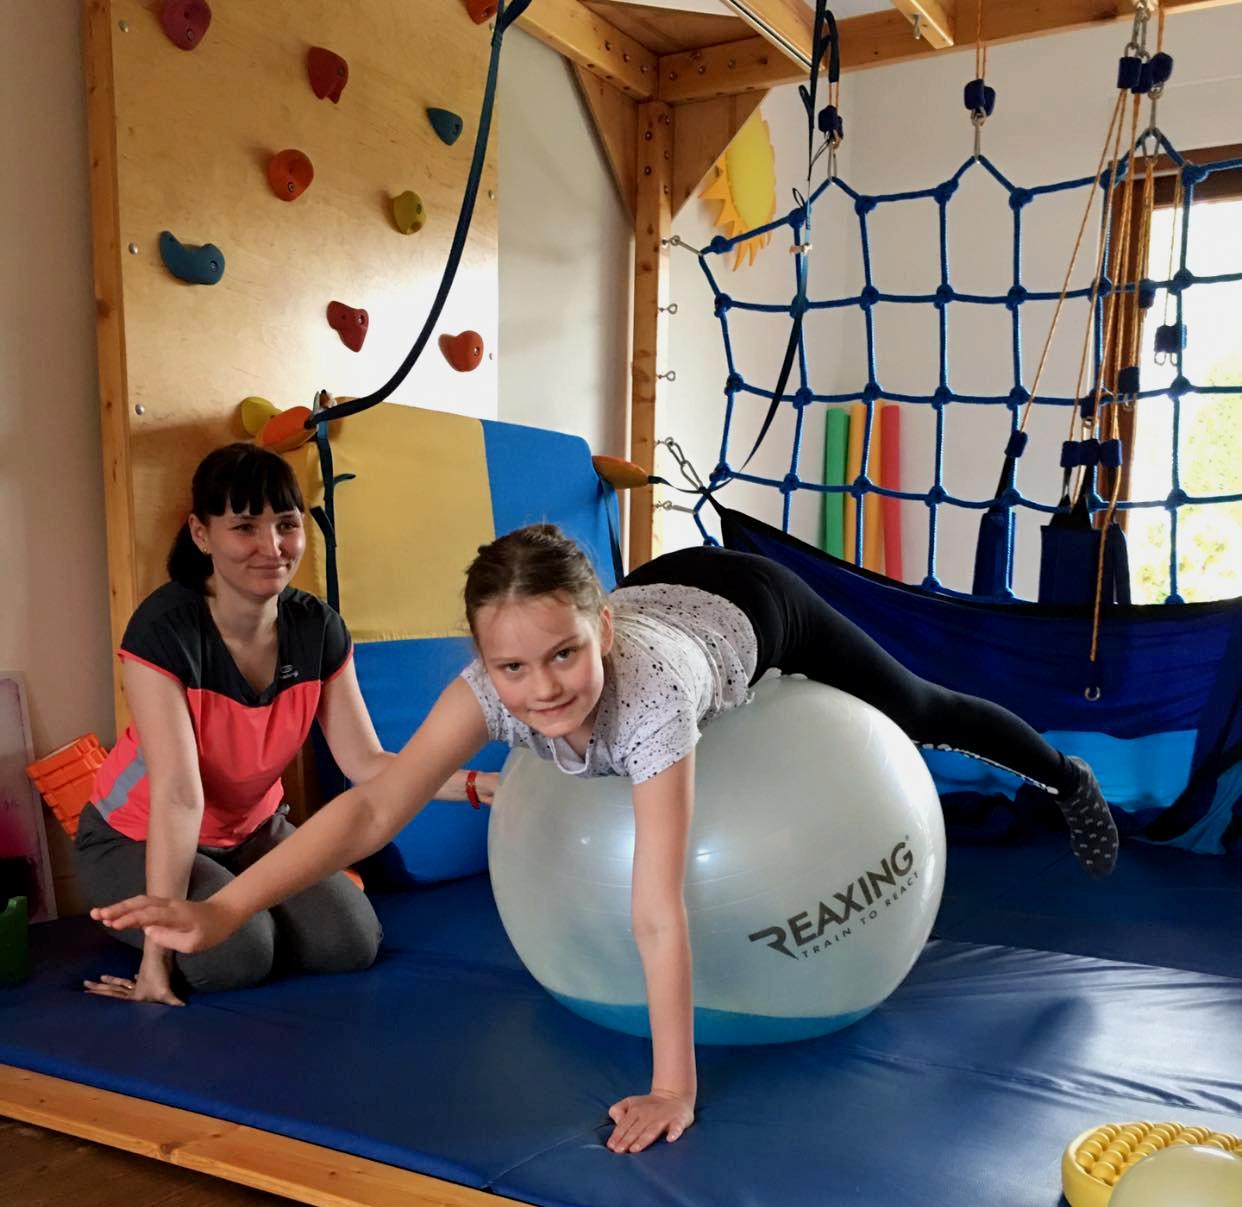 Terapia Dzieci Z Pilka Reax Fluiball 65cm